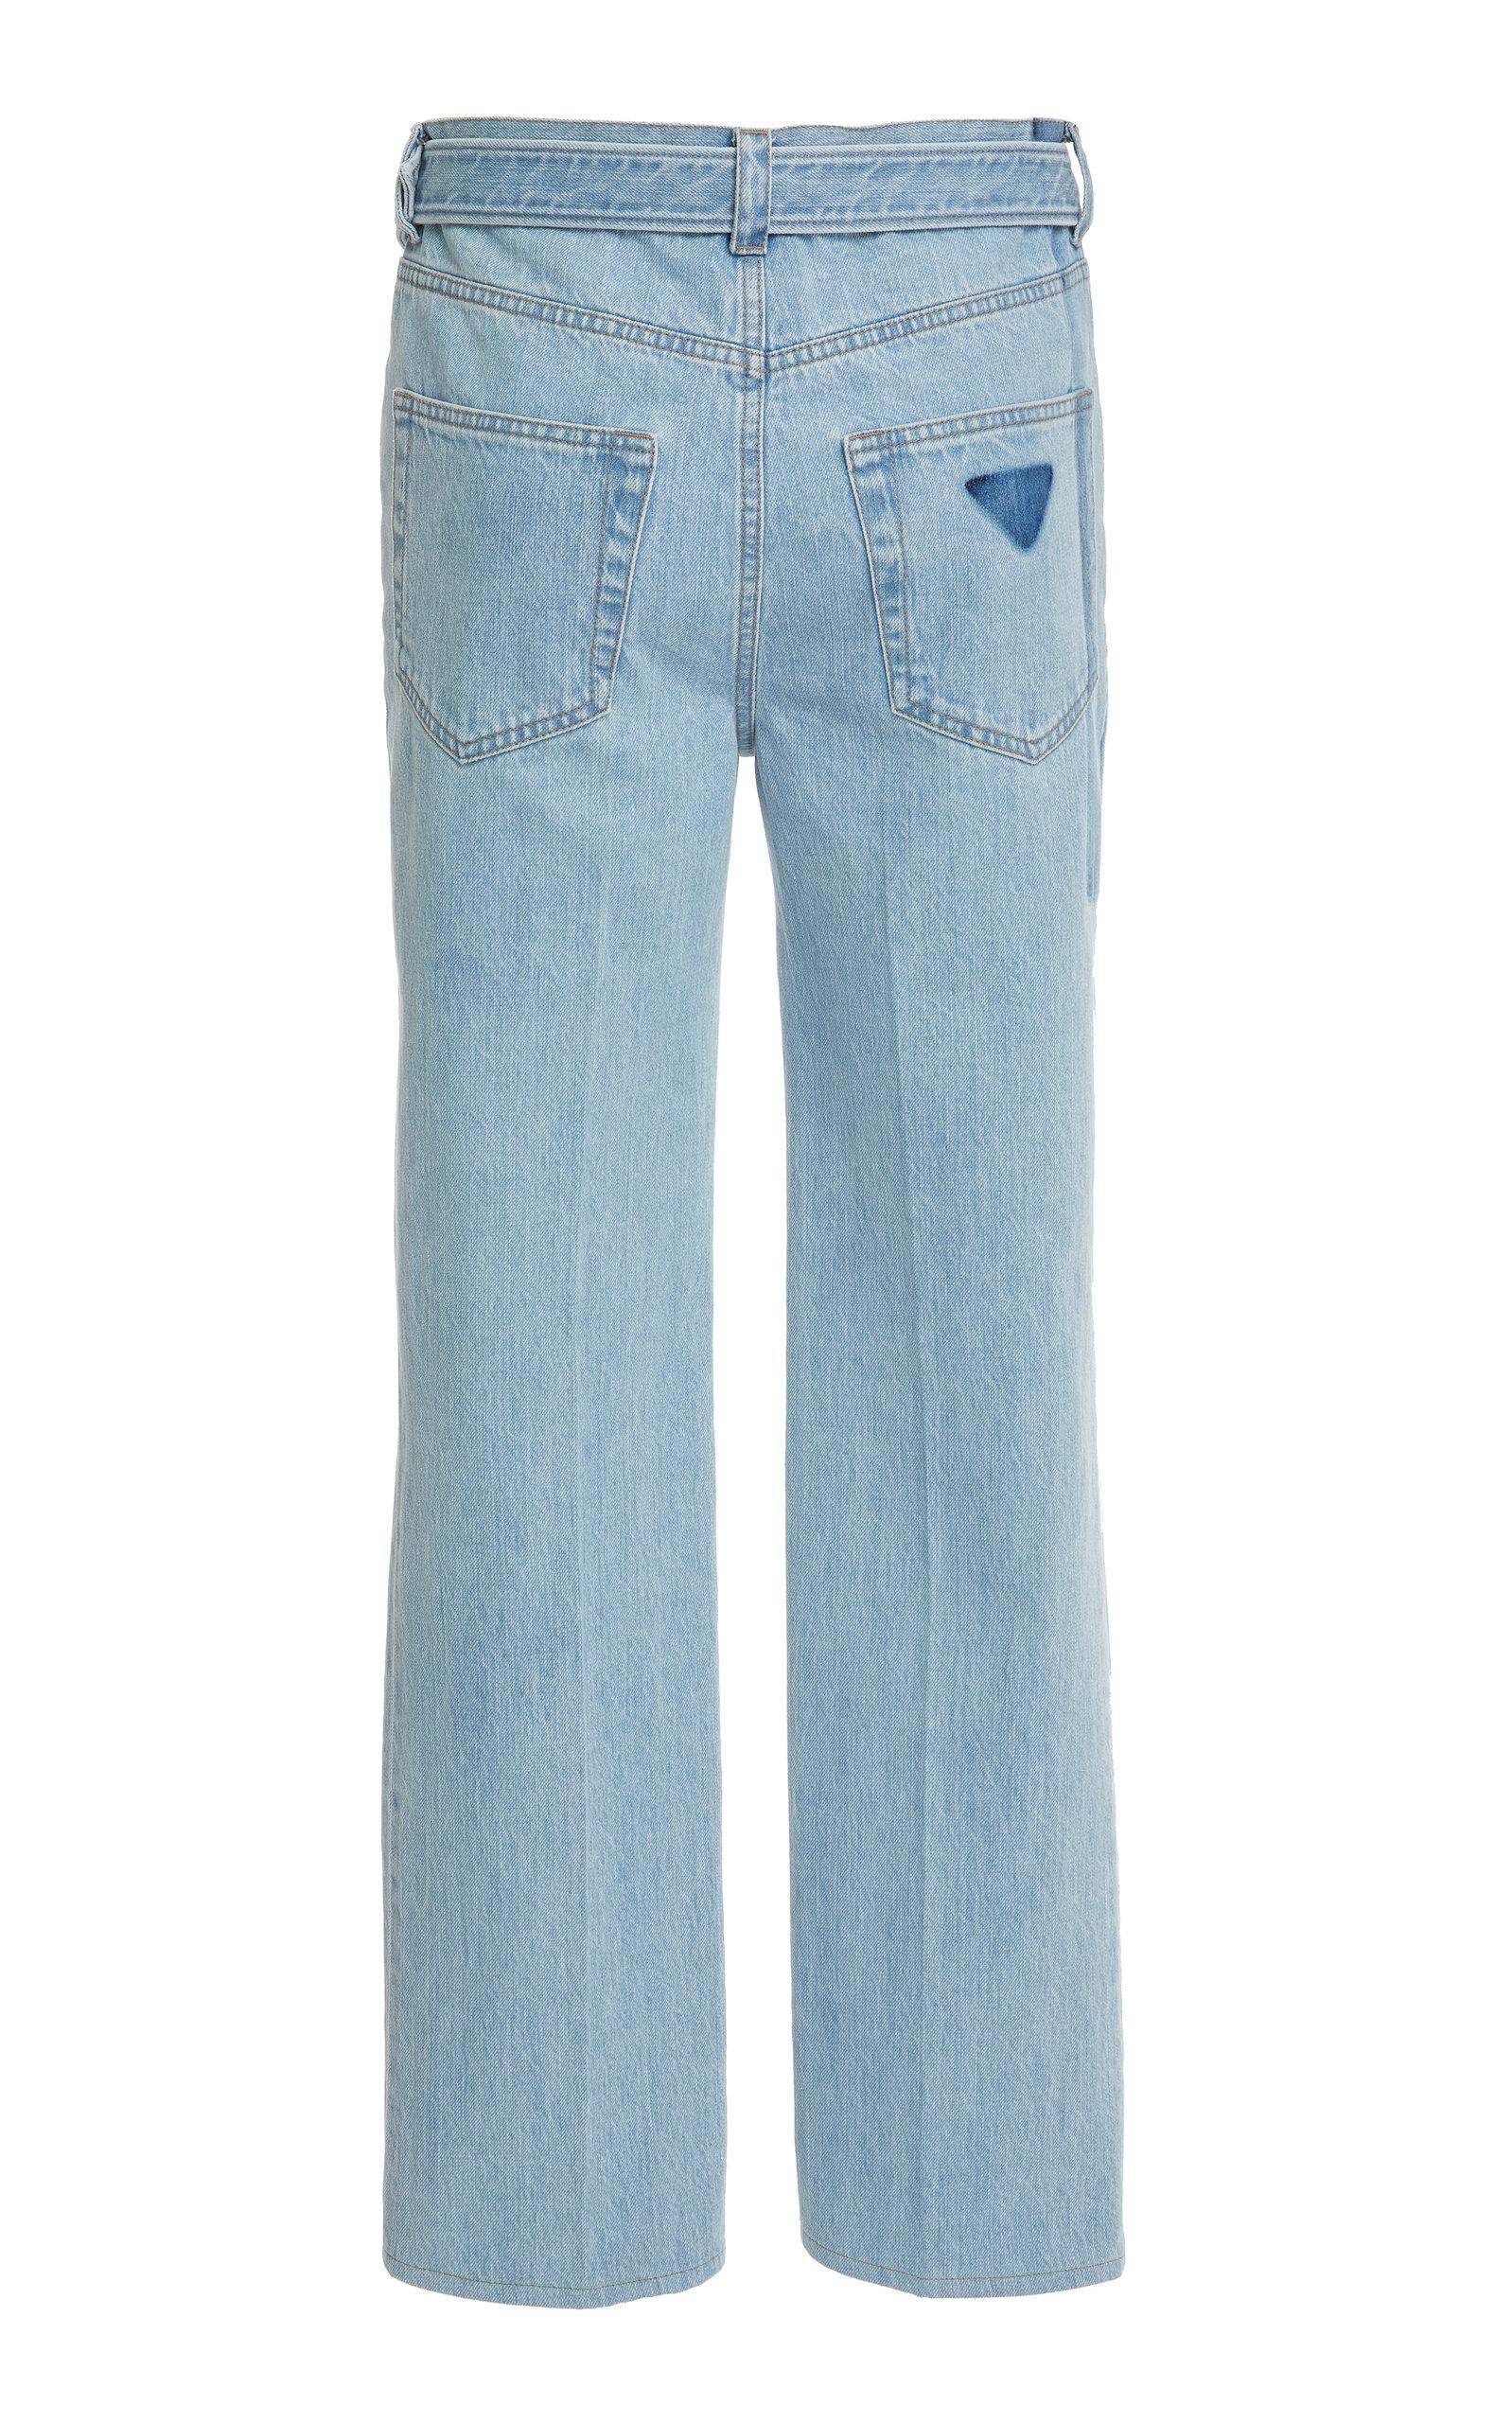 reputable site e9471 4afbb Selvage Denim Snow Jeans